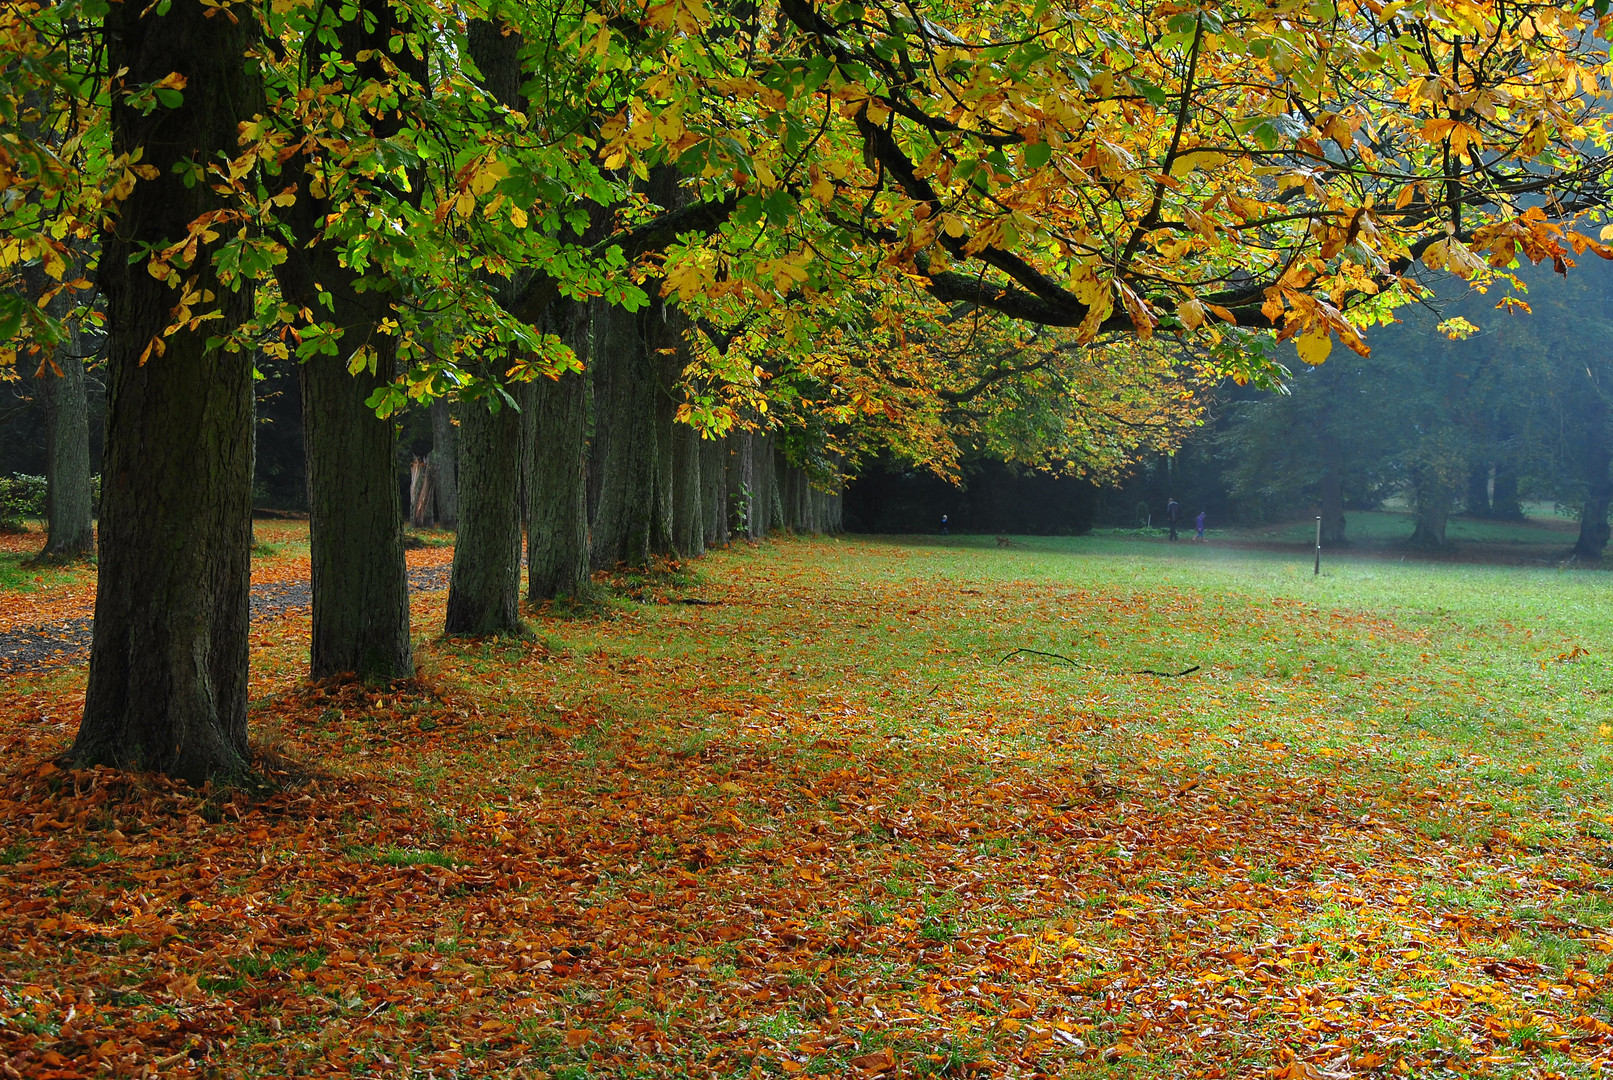 Herbst - autunno